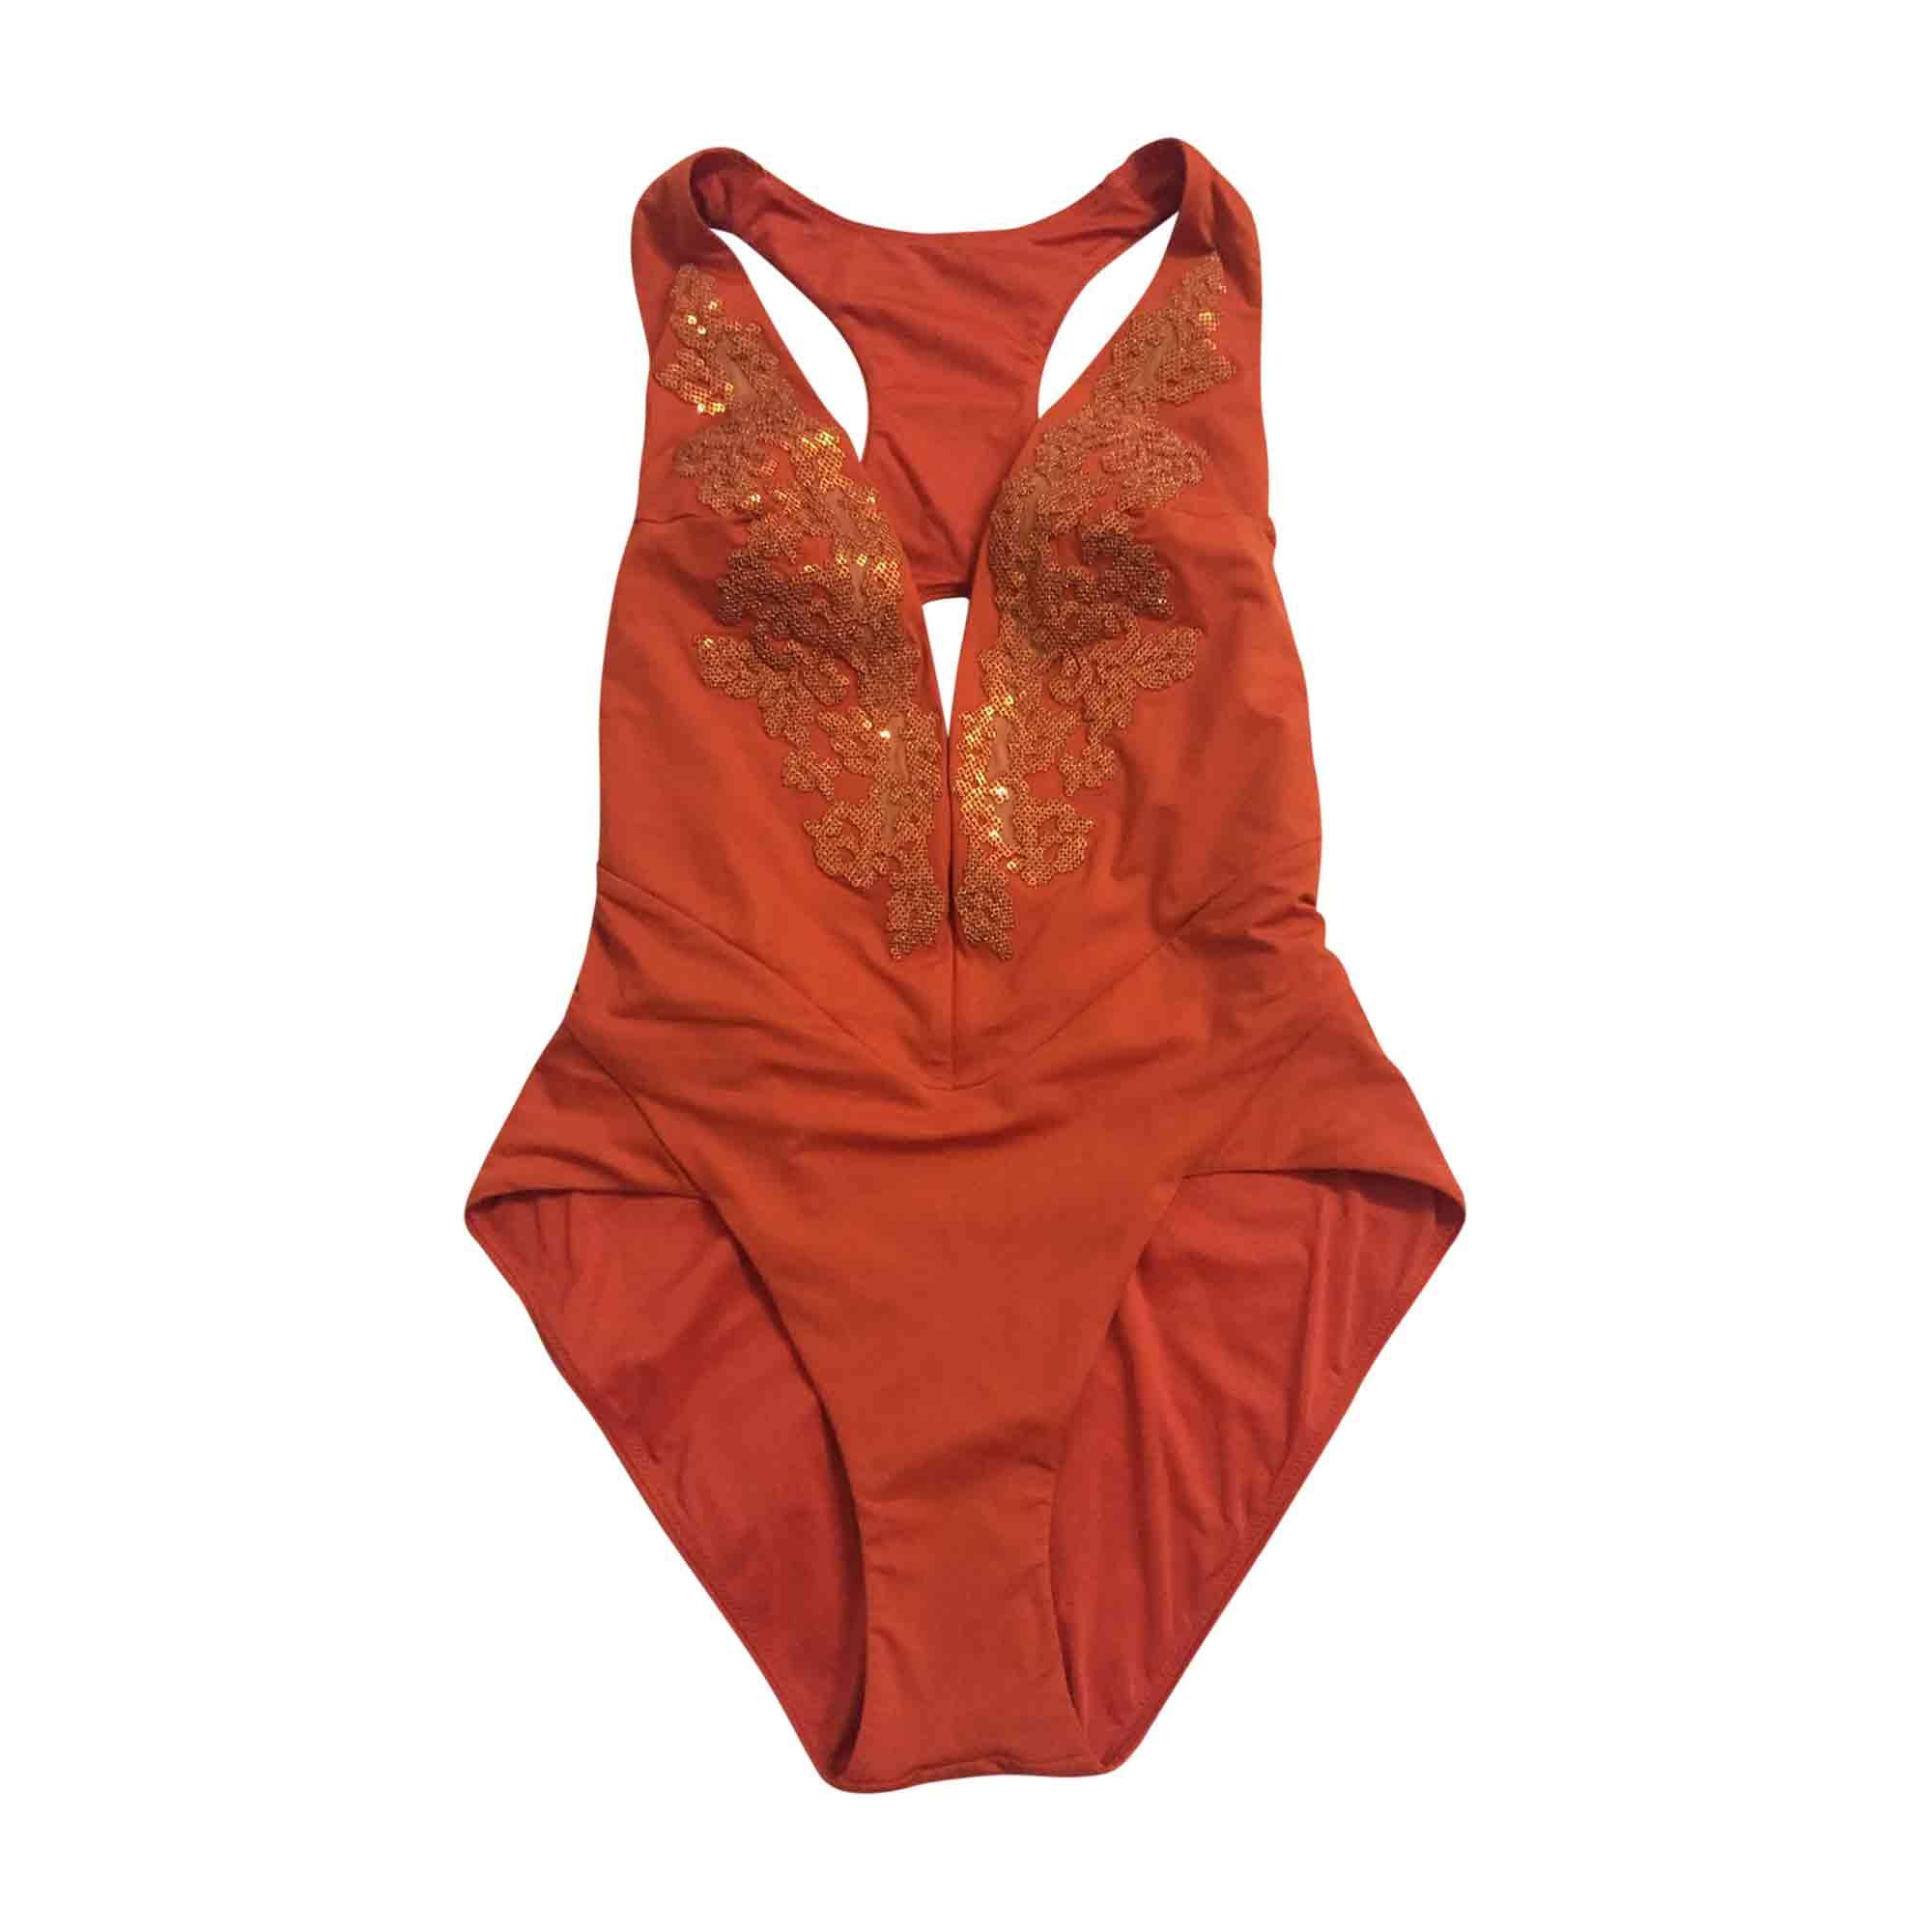 maillot de bain une pi ce la perla 40 l t3 orange vendu par xue 14 6808294. Black Bedroom Furniture Sets. Home Design Ideas